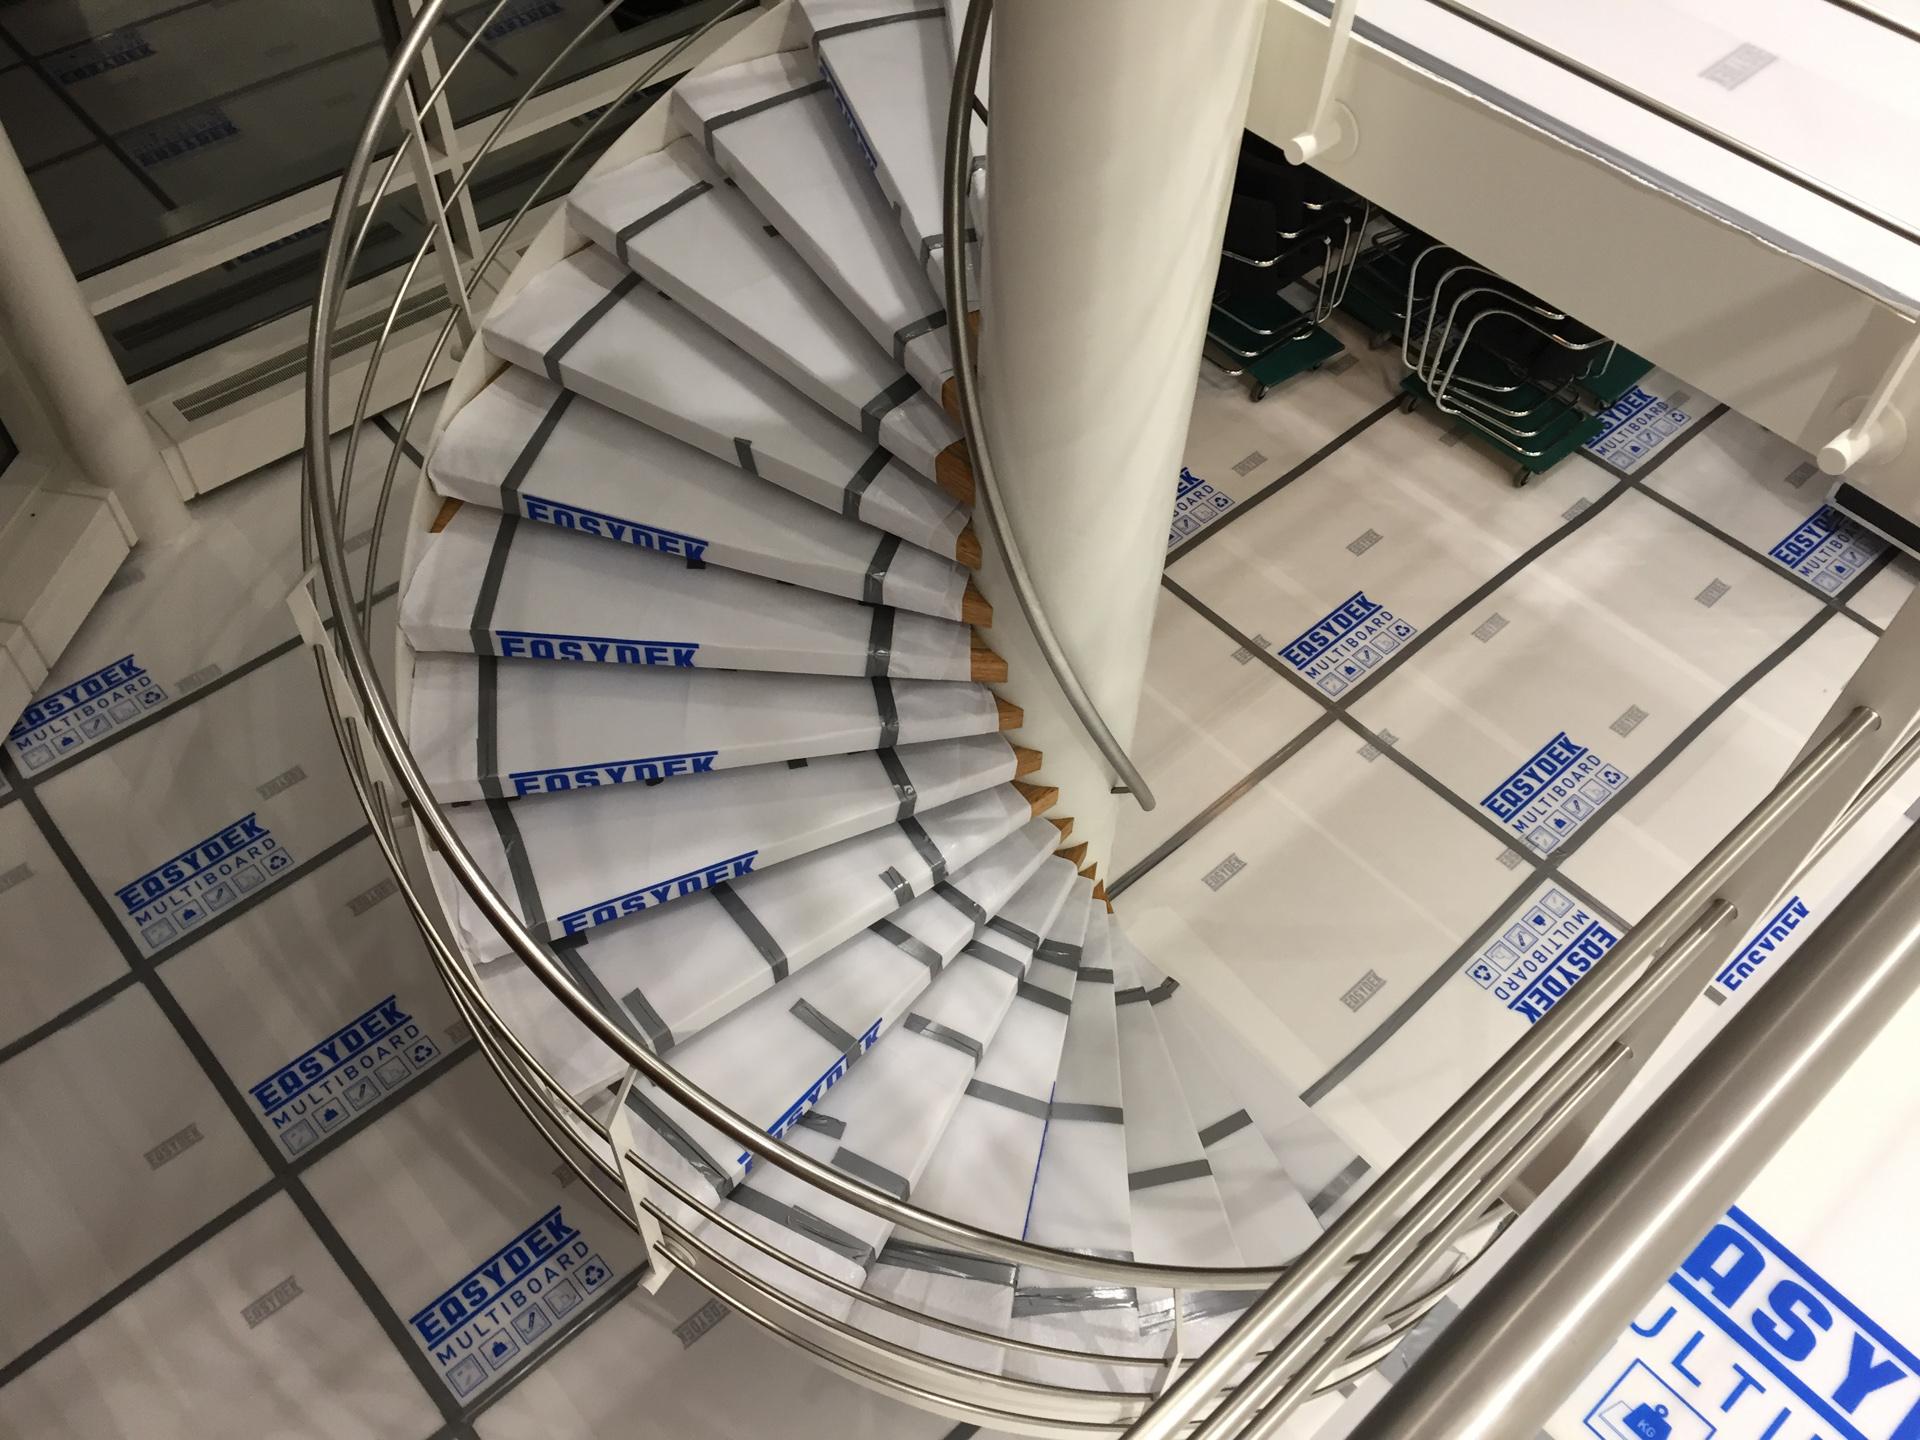 Abgedeckte Treppenstufen mit MULTI BOARD Kunststoff-Doppelsteg-Platten